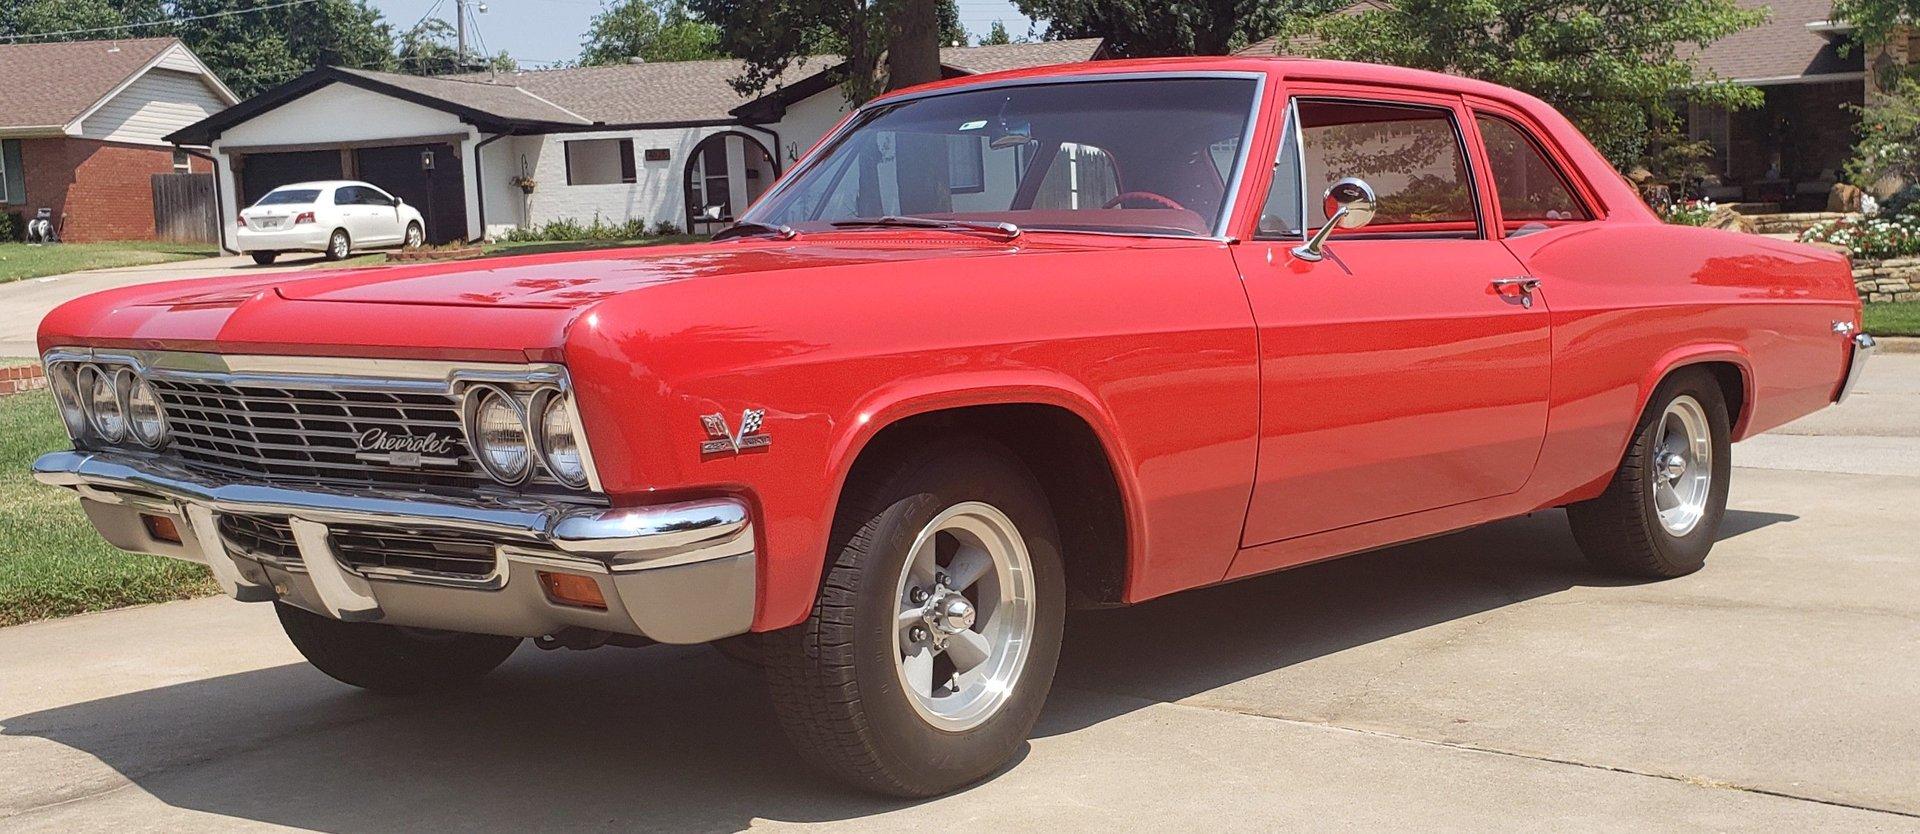 1966 chevrolet biscayne 2000r